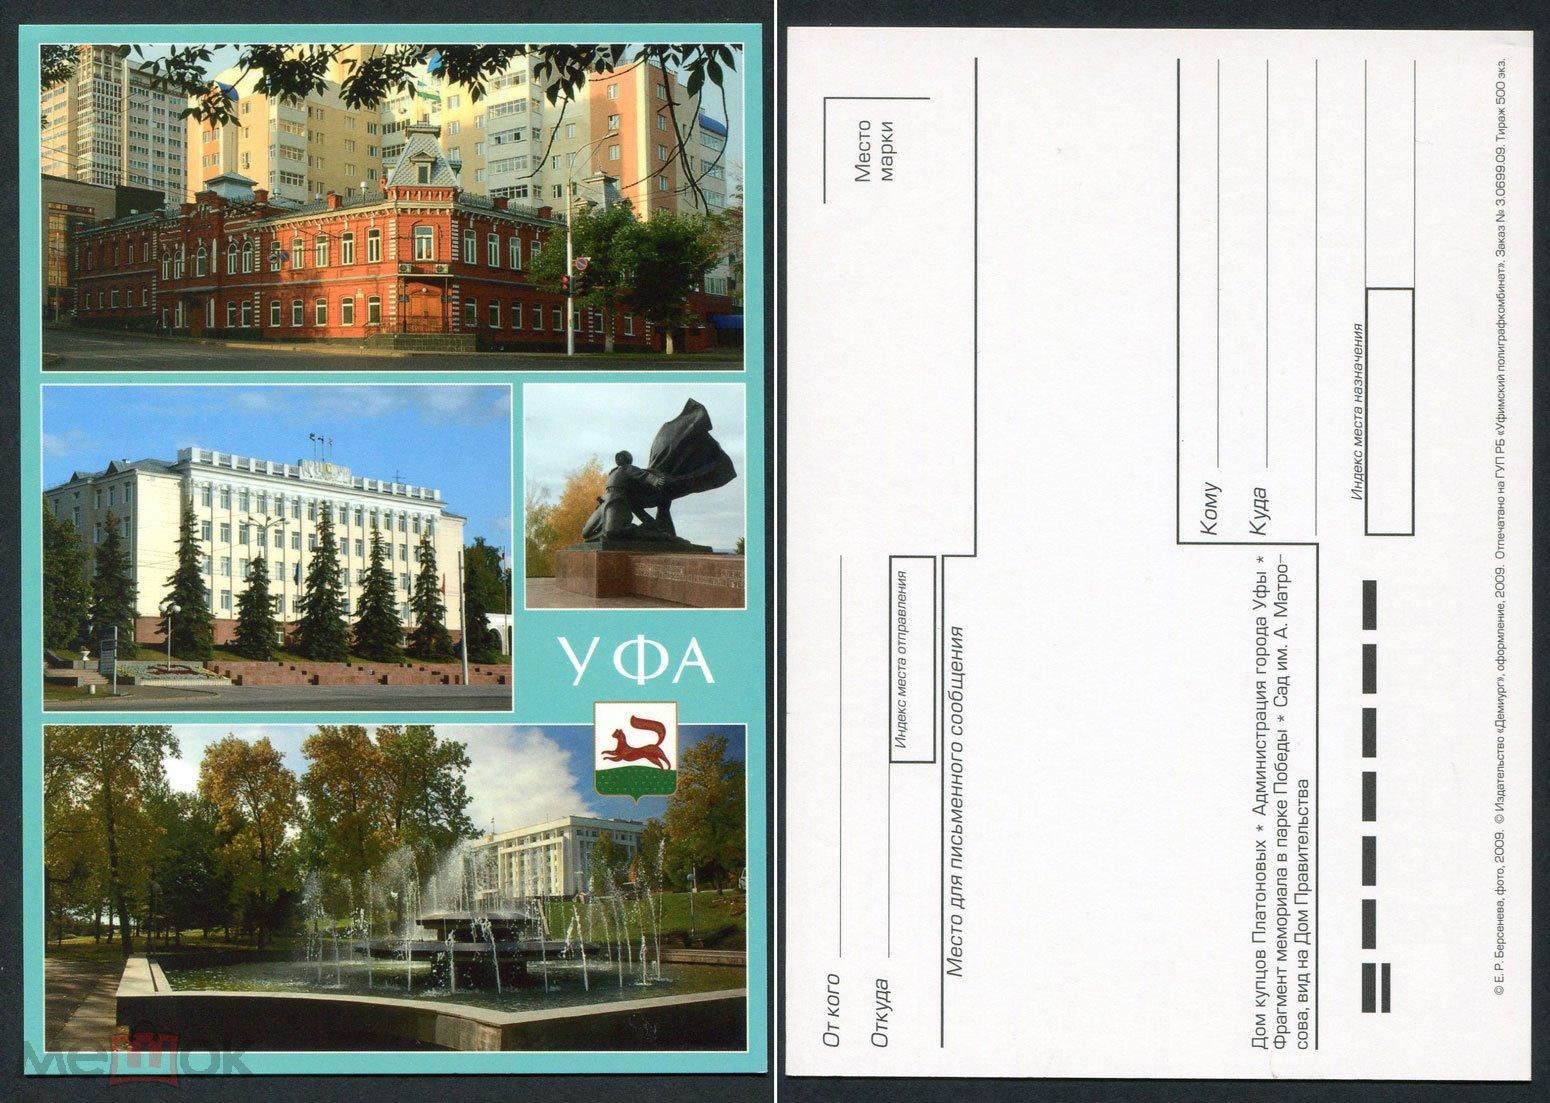 Открытка, открытки виды уфы